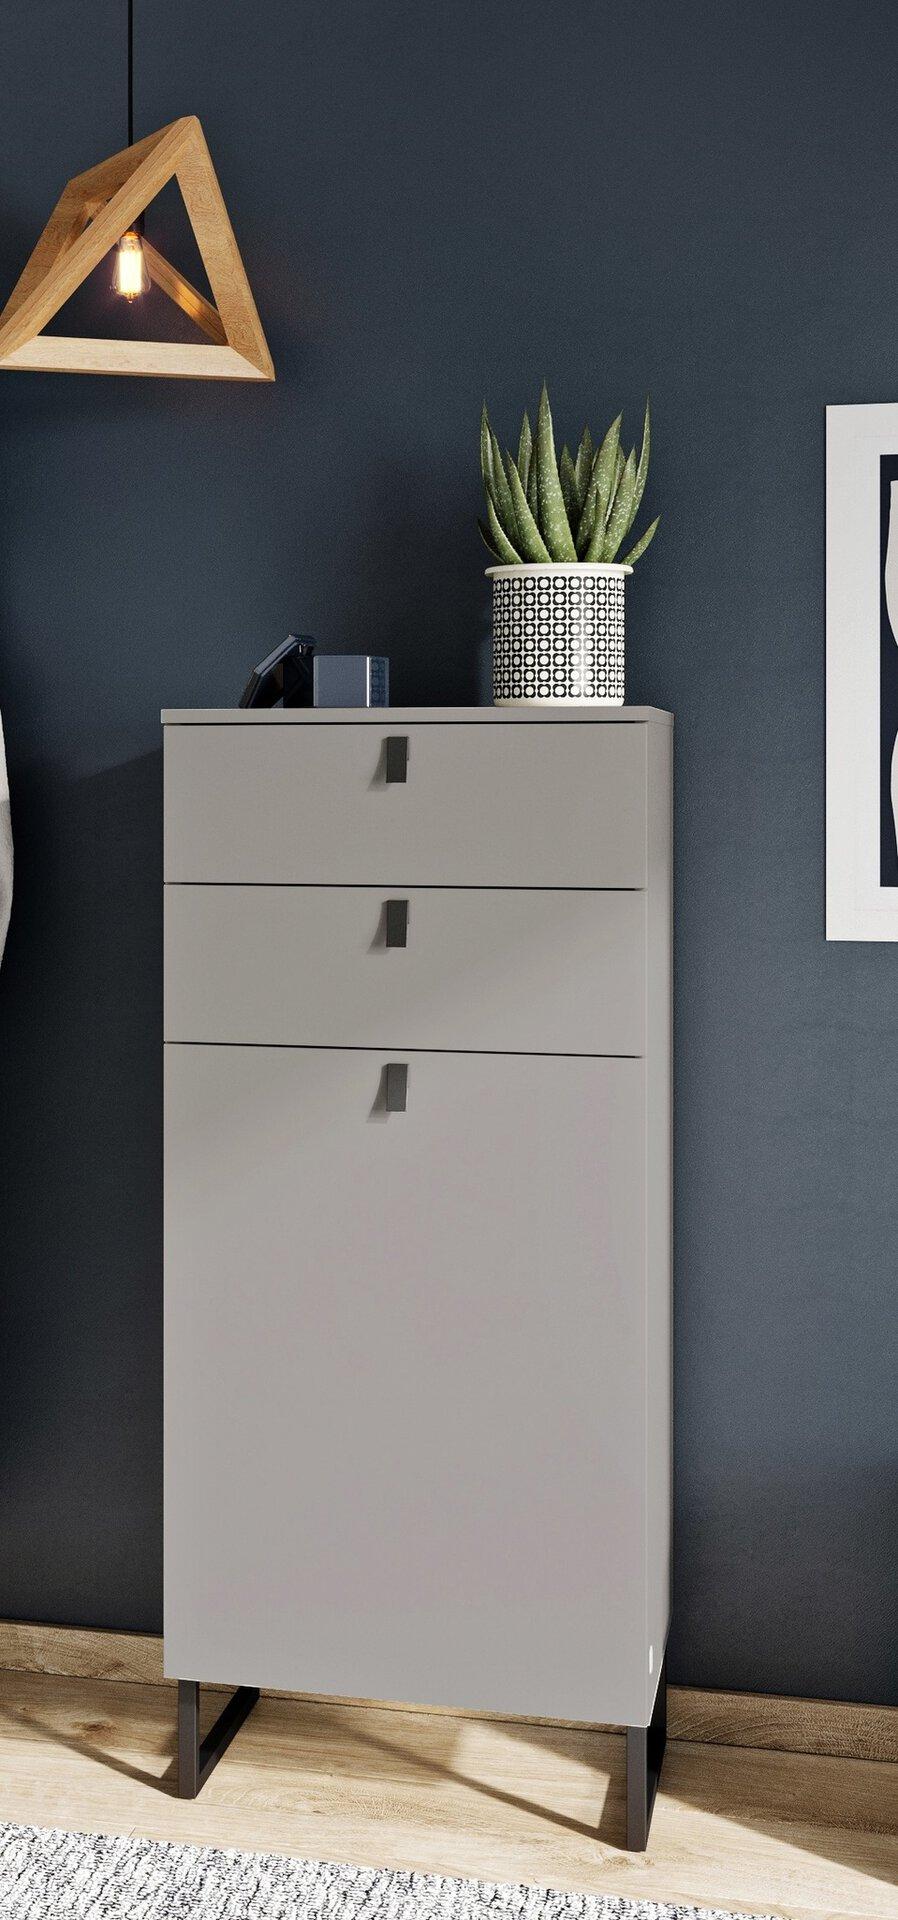 Schuhschrank Hallway 6008 3993-186 Vito Holzwerkstoff grau 1 x 1 x